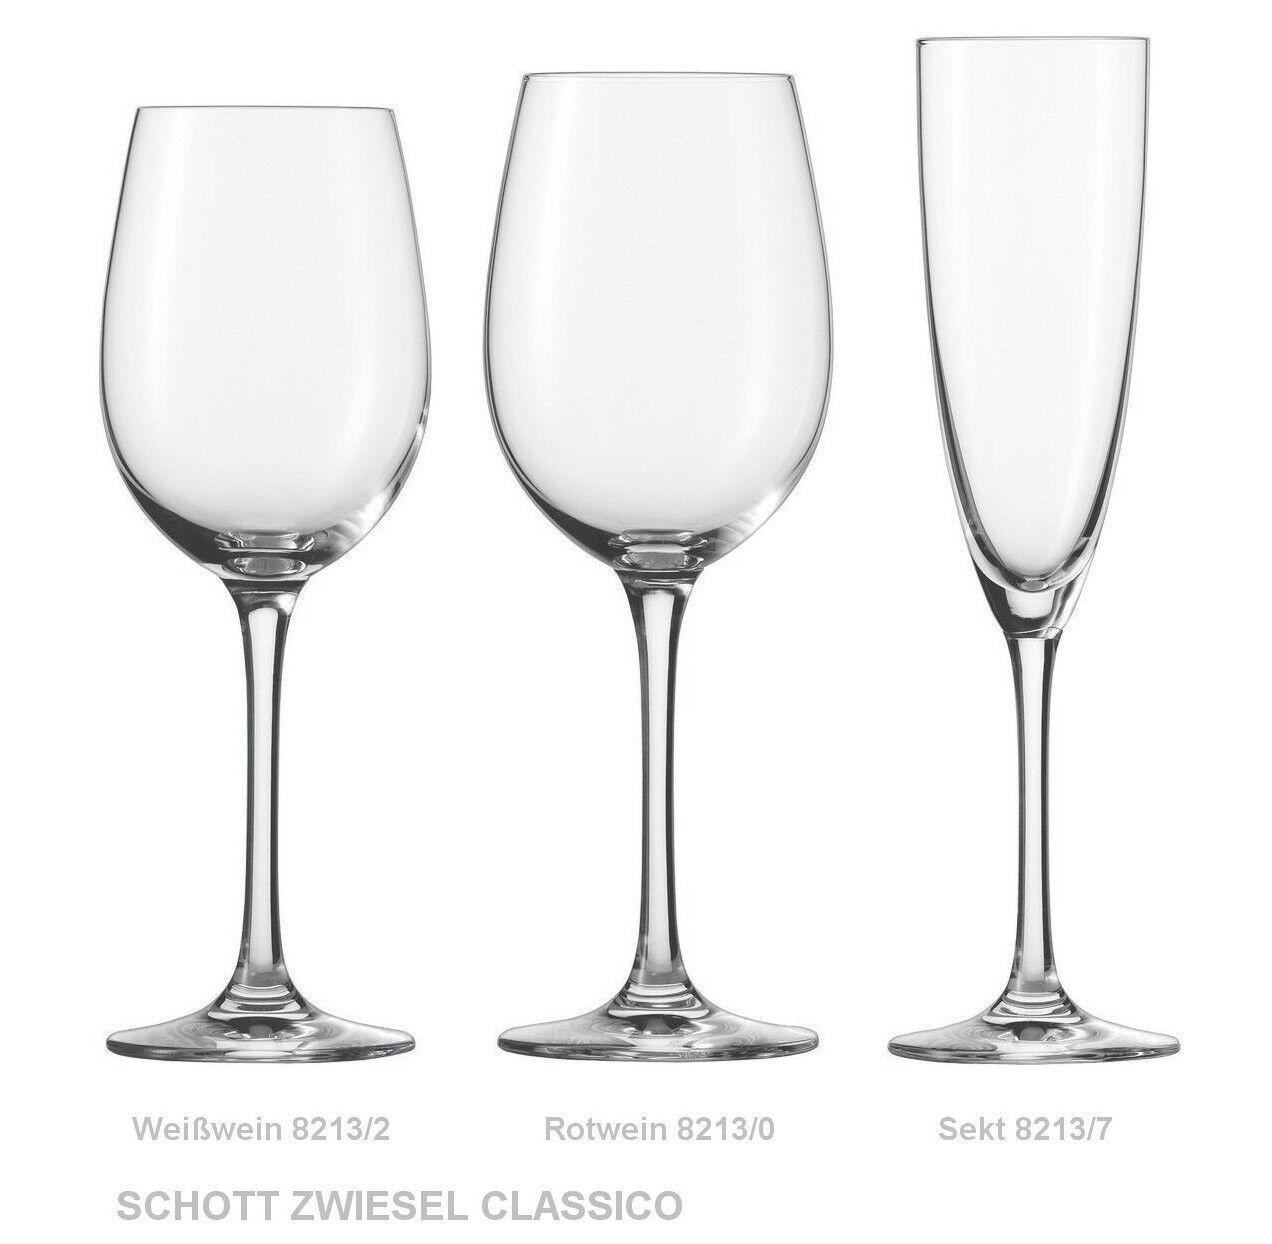 18 Weingläser SCHOTT ZWIESEL je 6 ROTWEIN- WEISSWEIN- + Sekt-Glas CLASSICO  8213